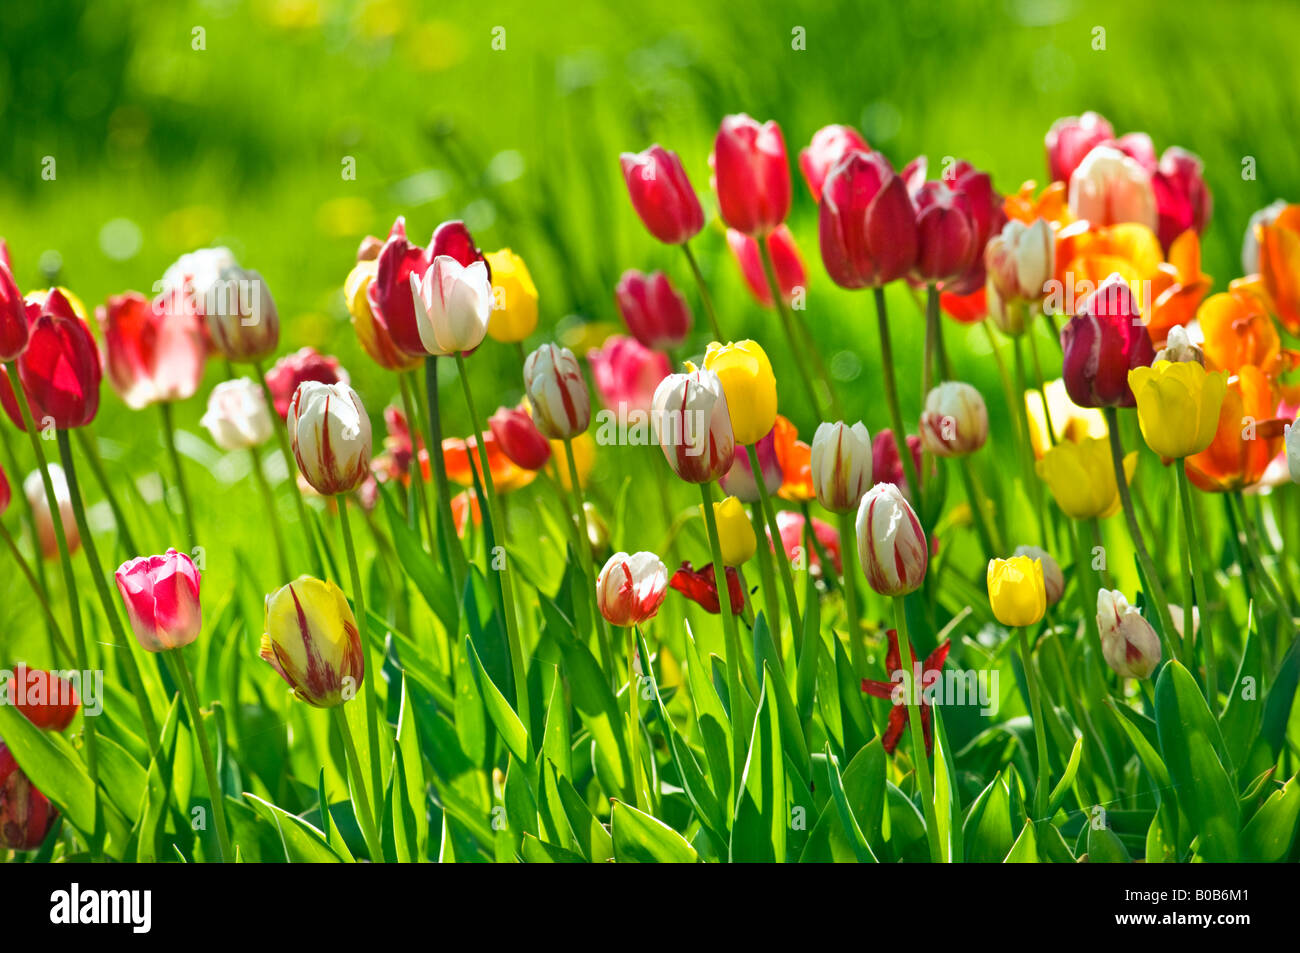 Tulip field flower garden flowers springtime spring plant plants tulip field flower garden flowers springtime spring plant plants green yellow blue red mightylinksfo Gallery